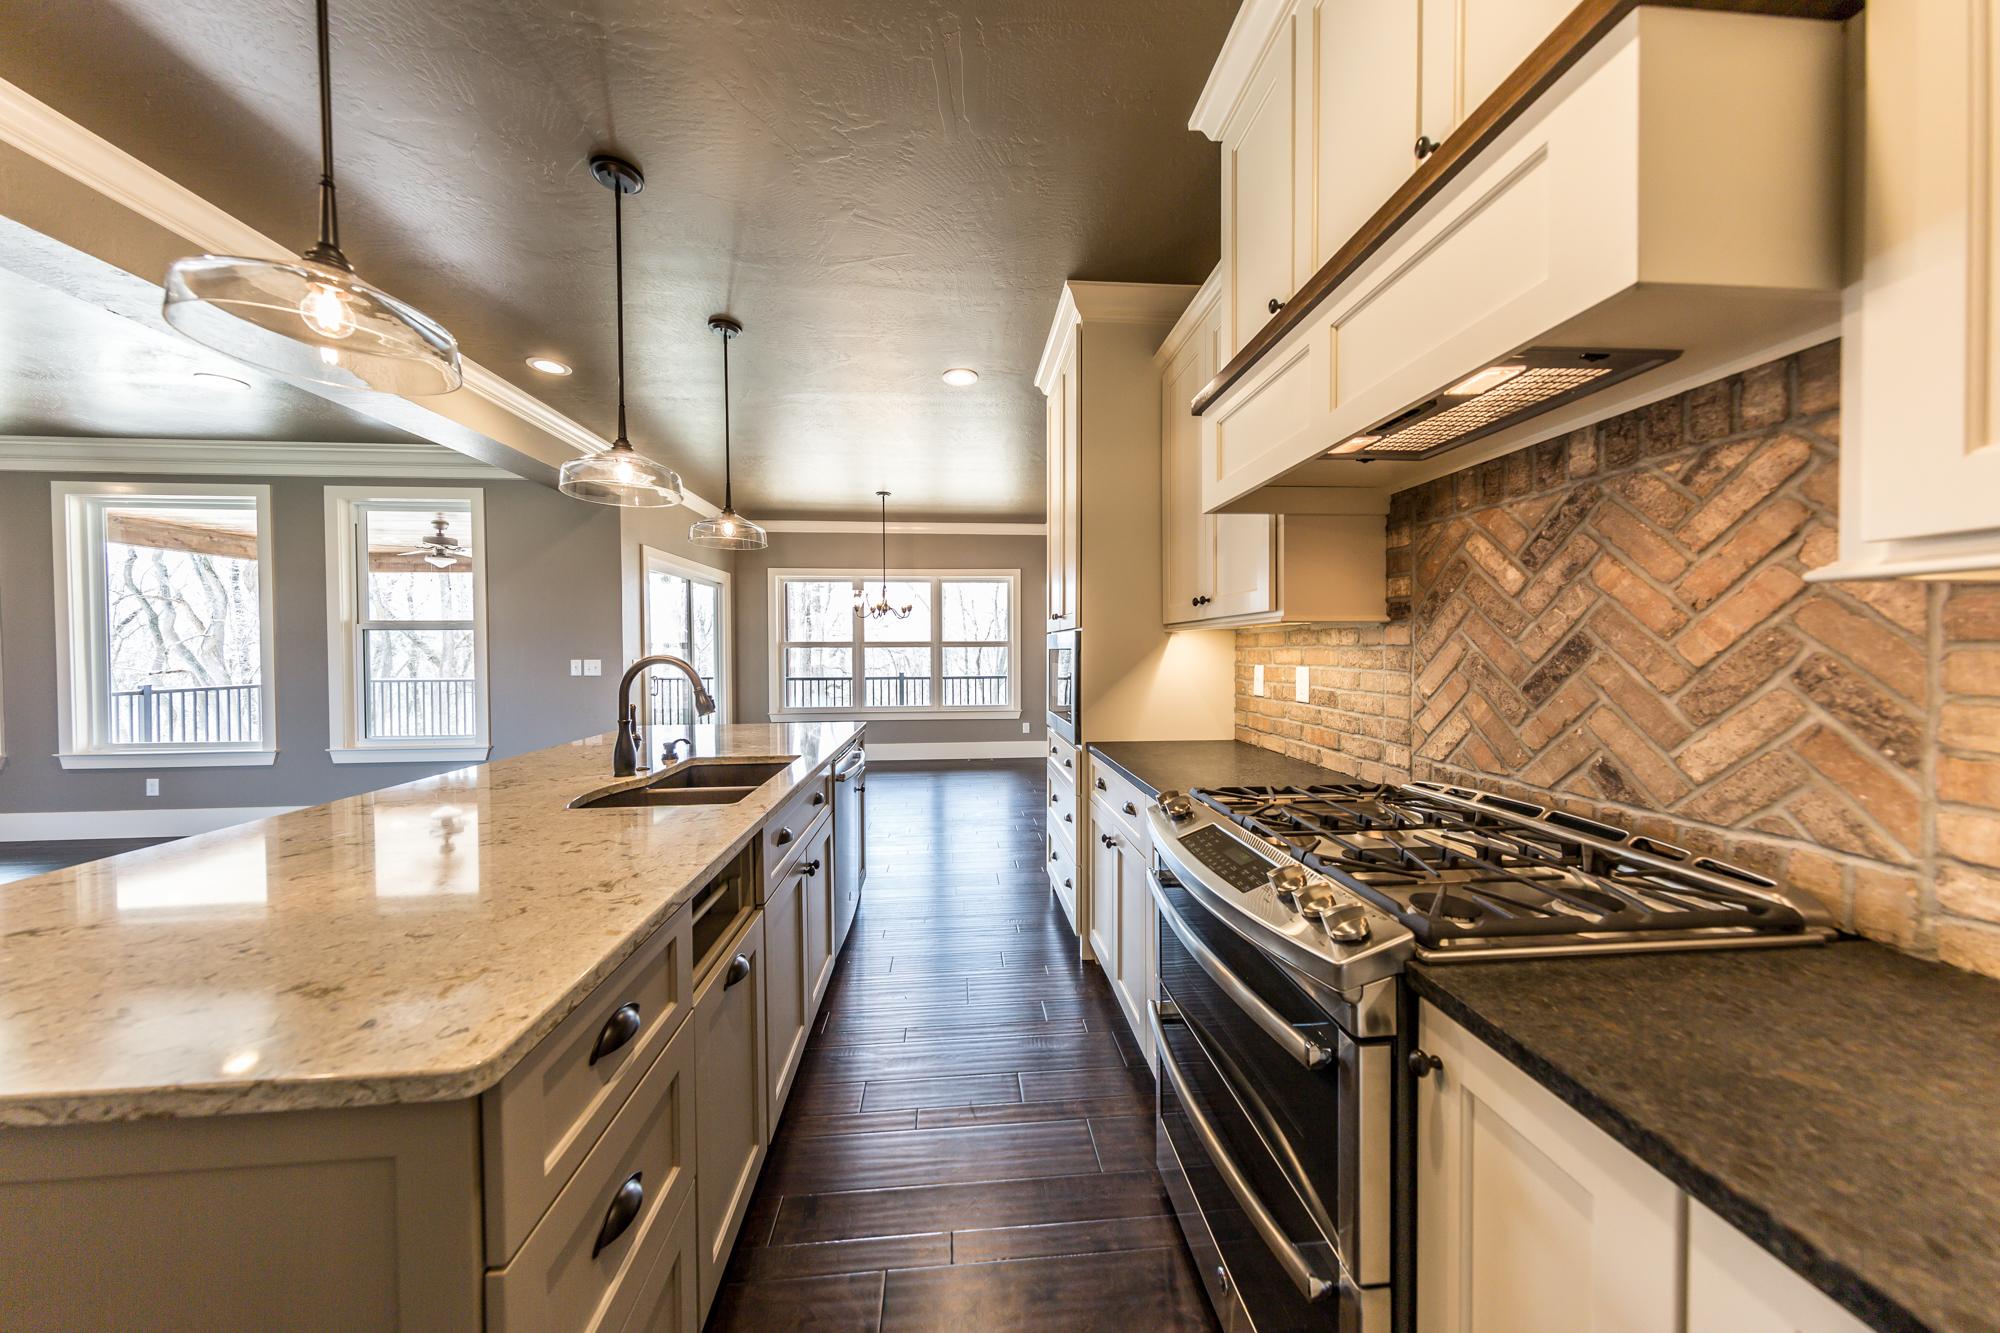 New-Construction-For-Sale-Bethel-Ridge-Farms-Scott-AFB-Illinois-10.4.jpg